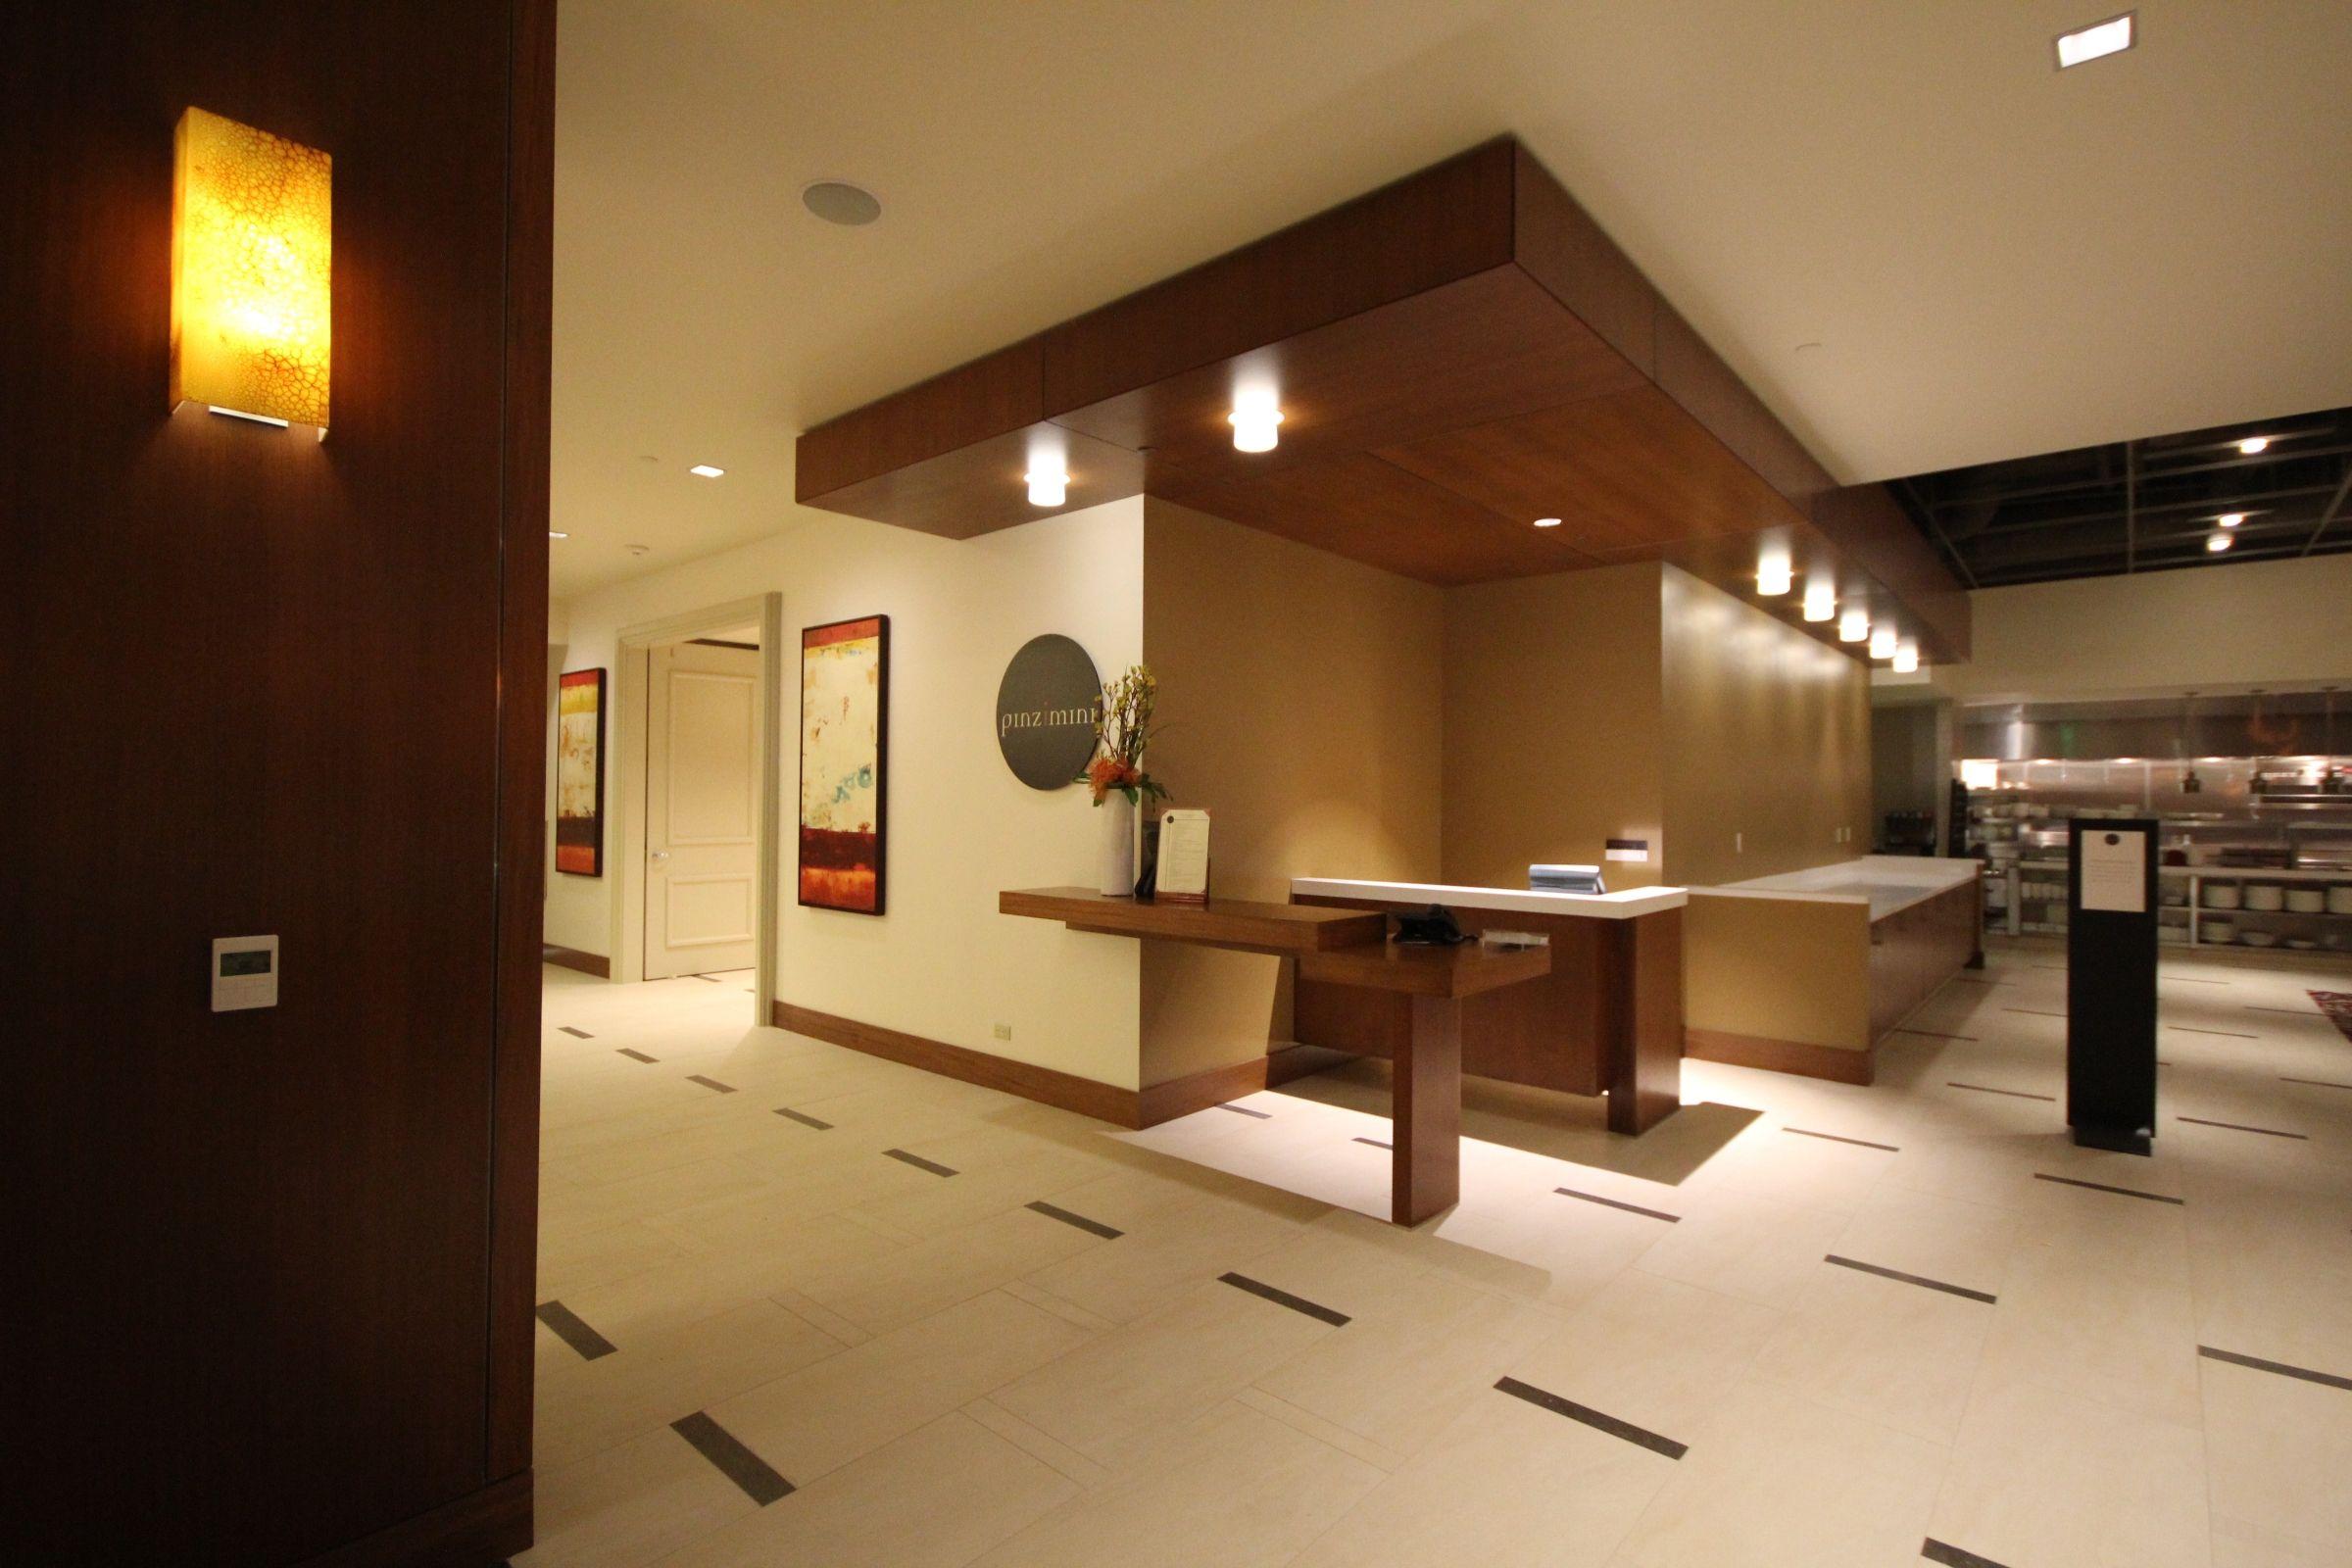 Westin Gaslamp Hotel Exterior Lighting Design